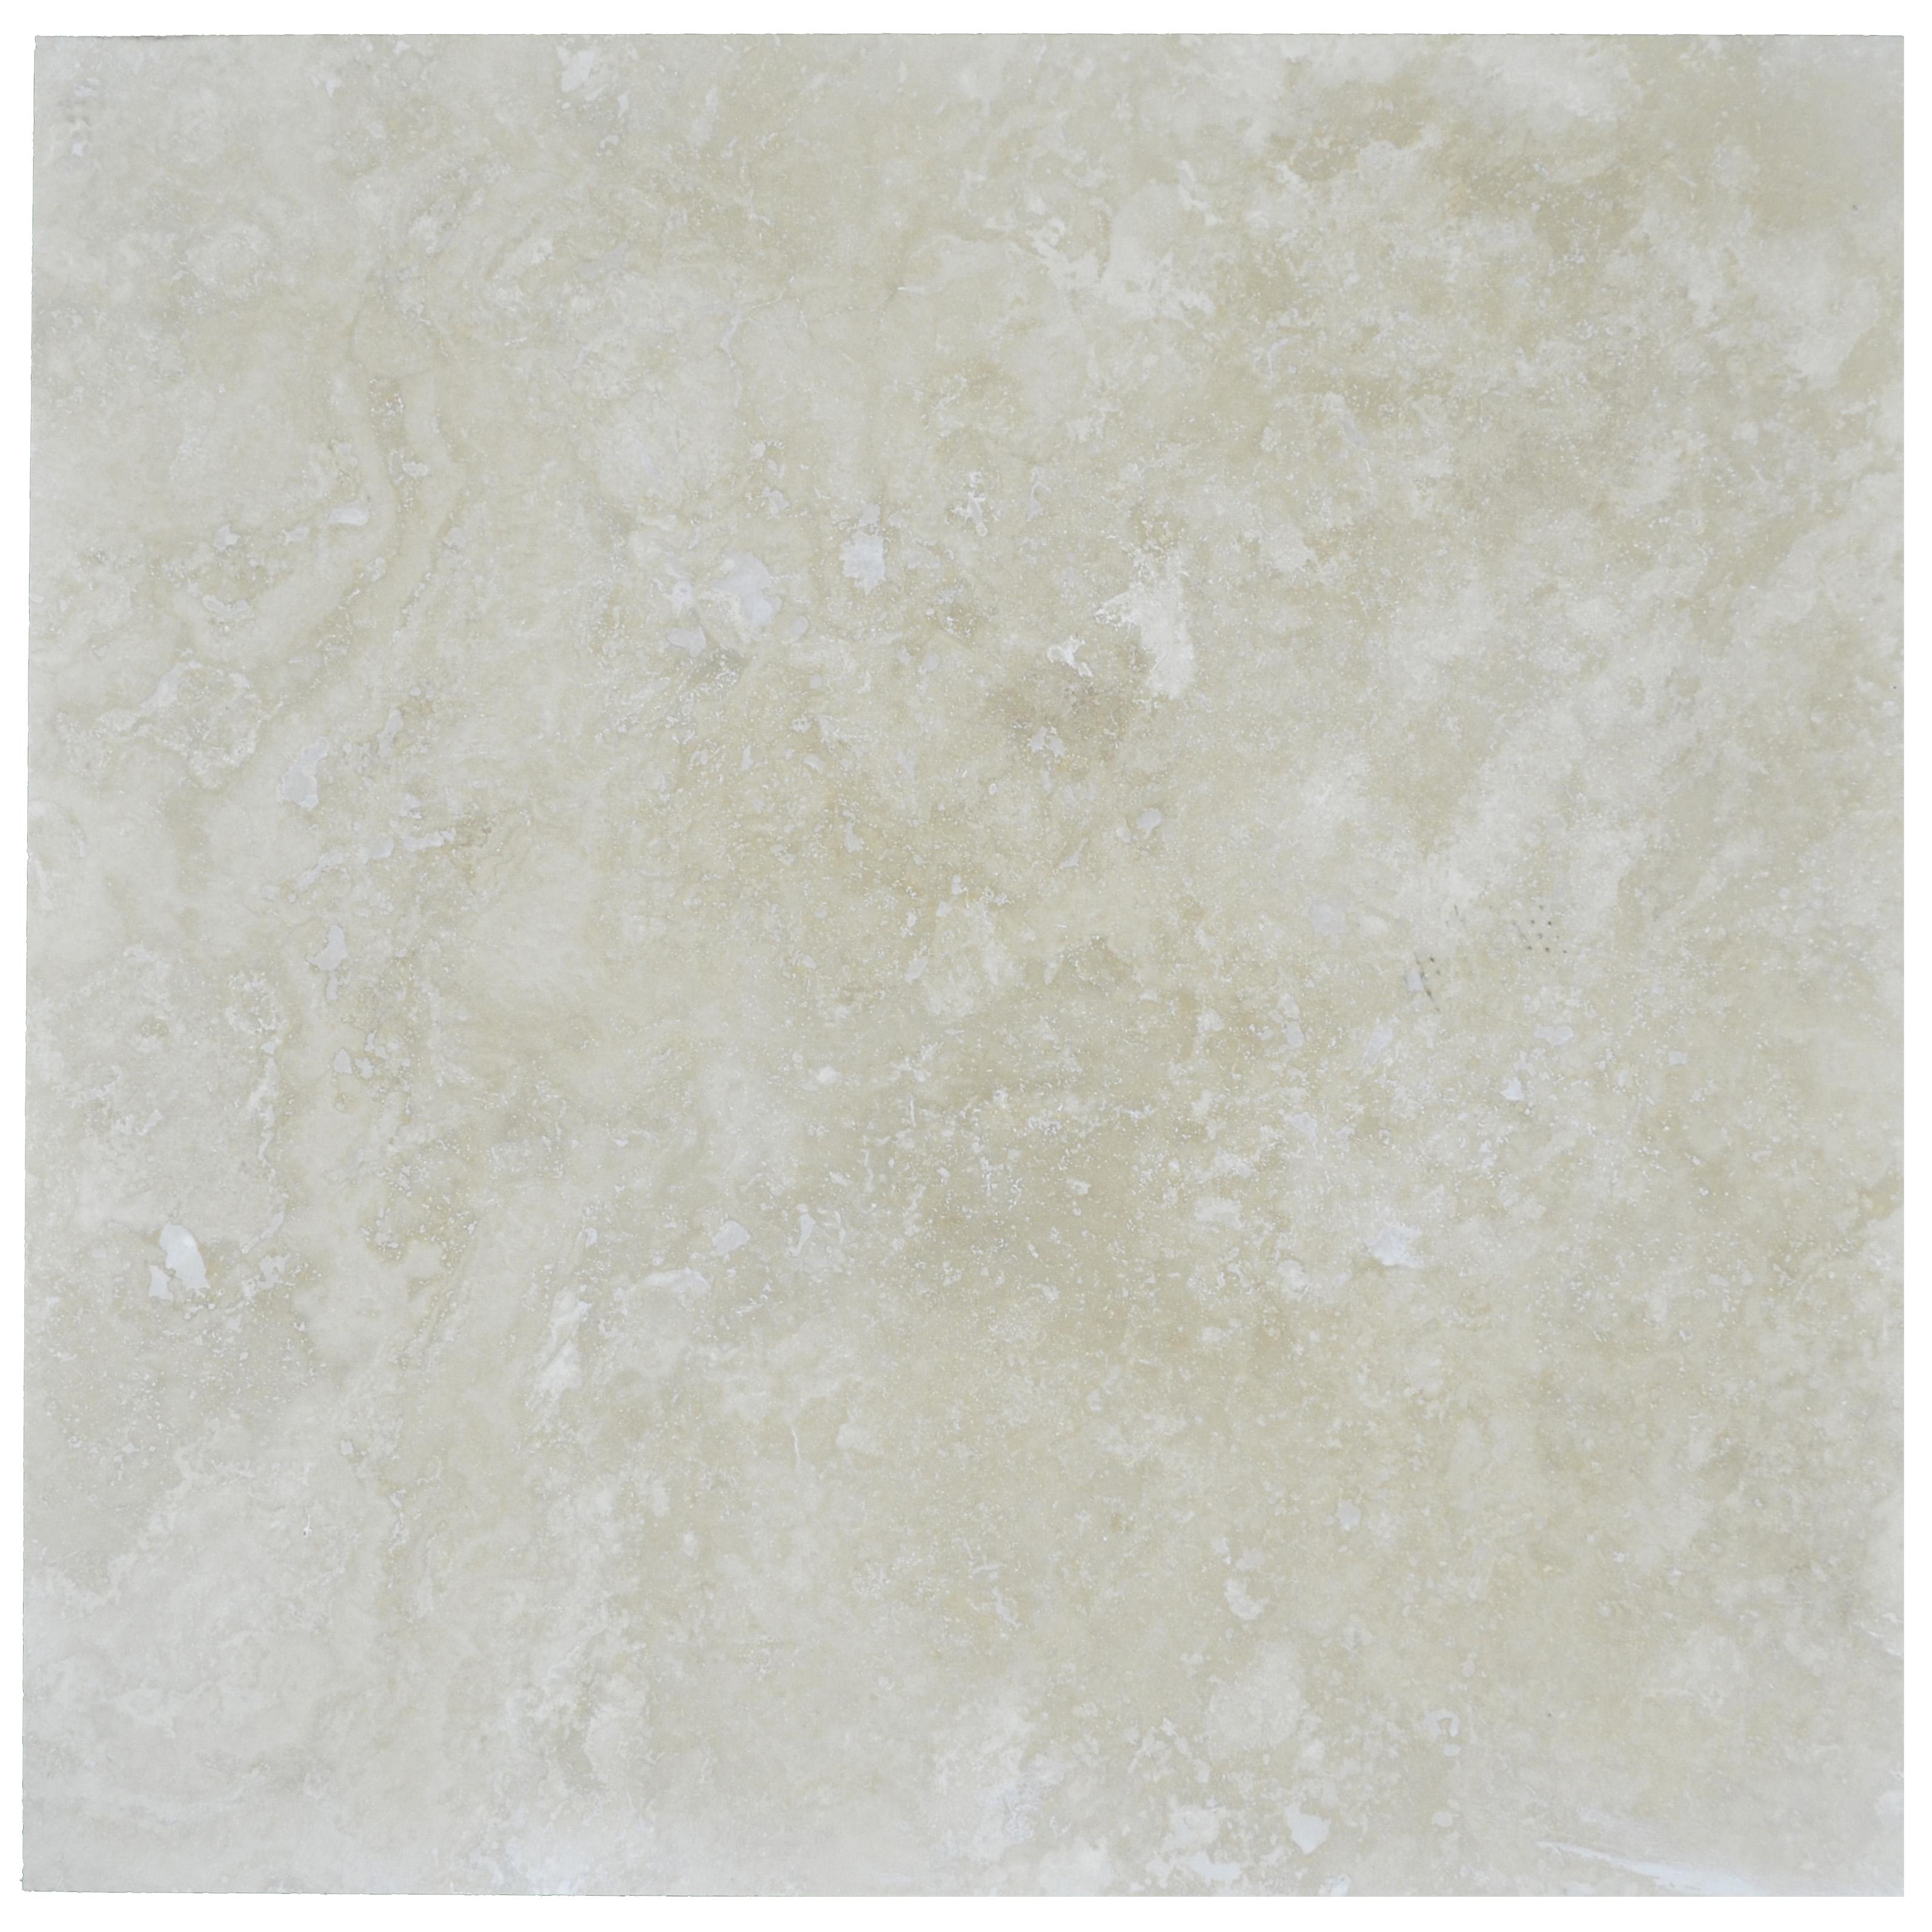 Frig Light Honed Filled Travertine Tiles 24x24 Travertine tiles sale-Atlantic Stone Source